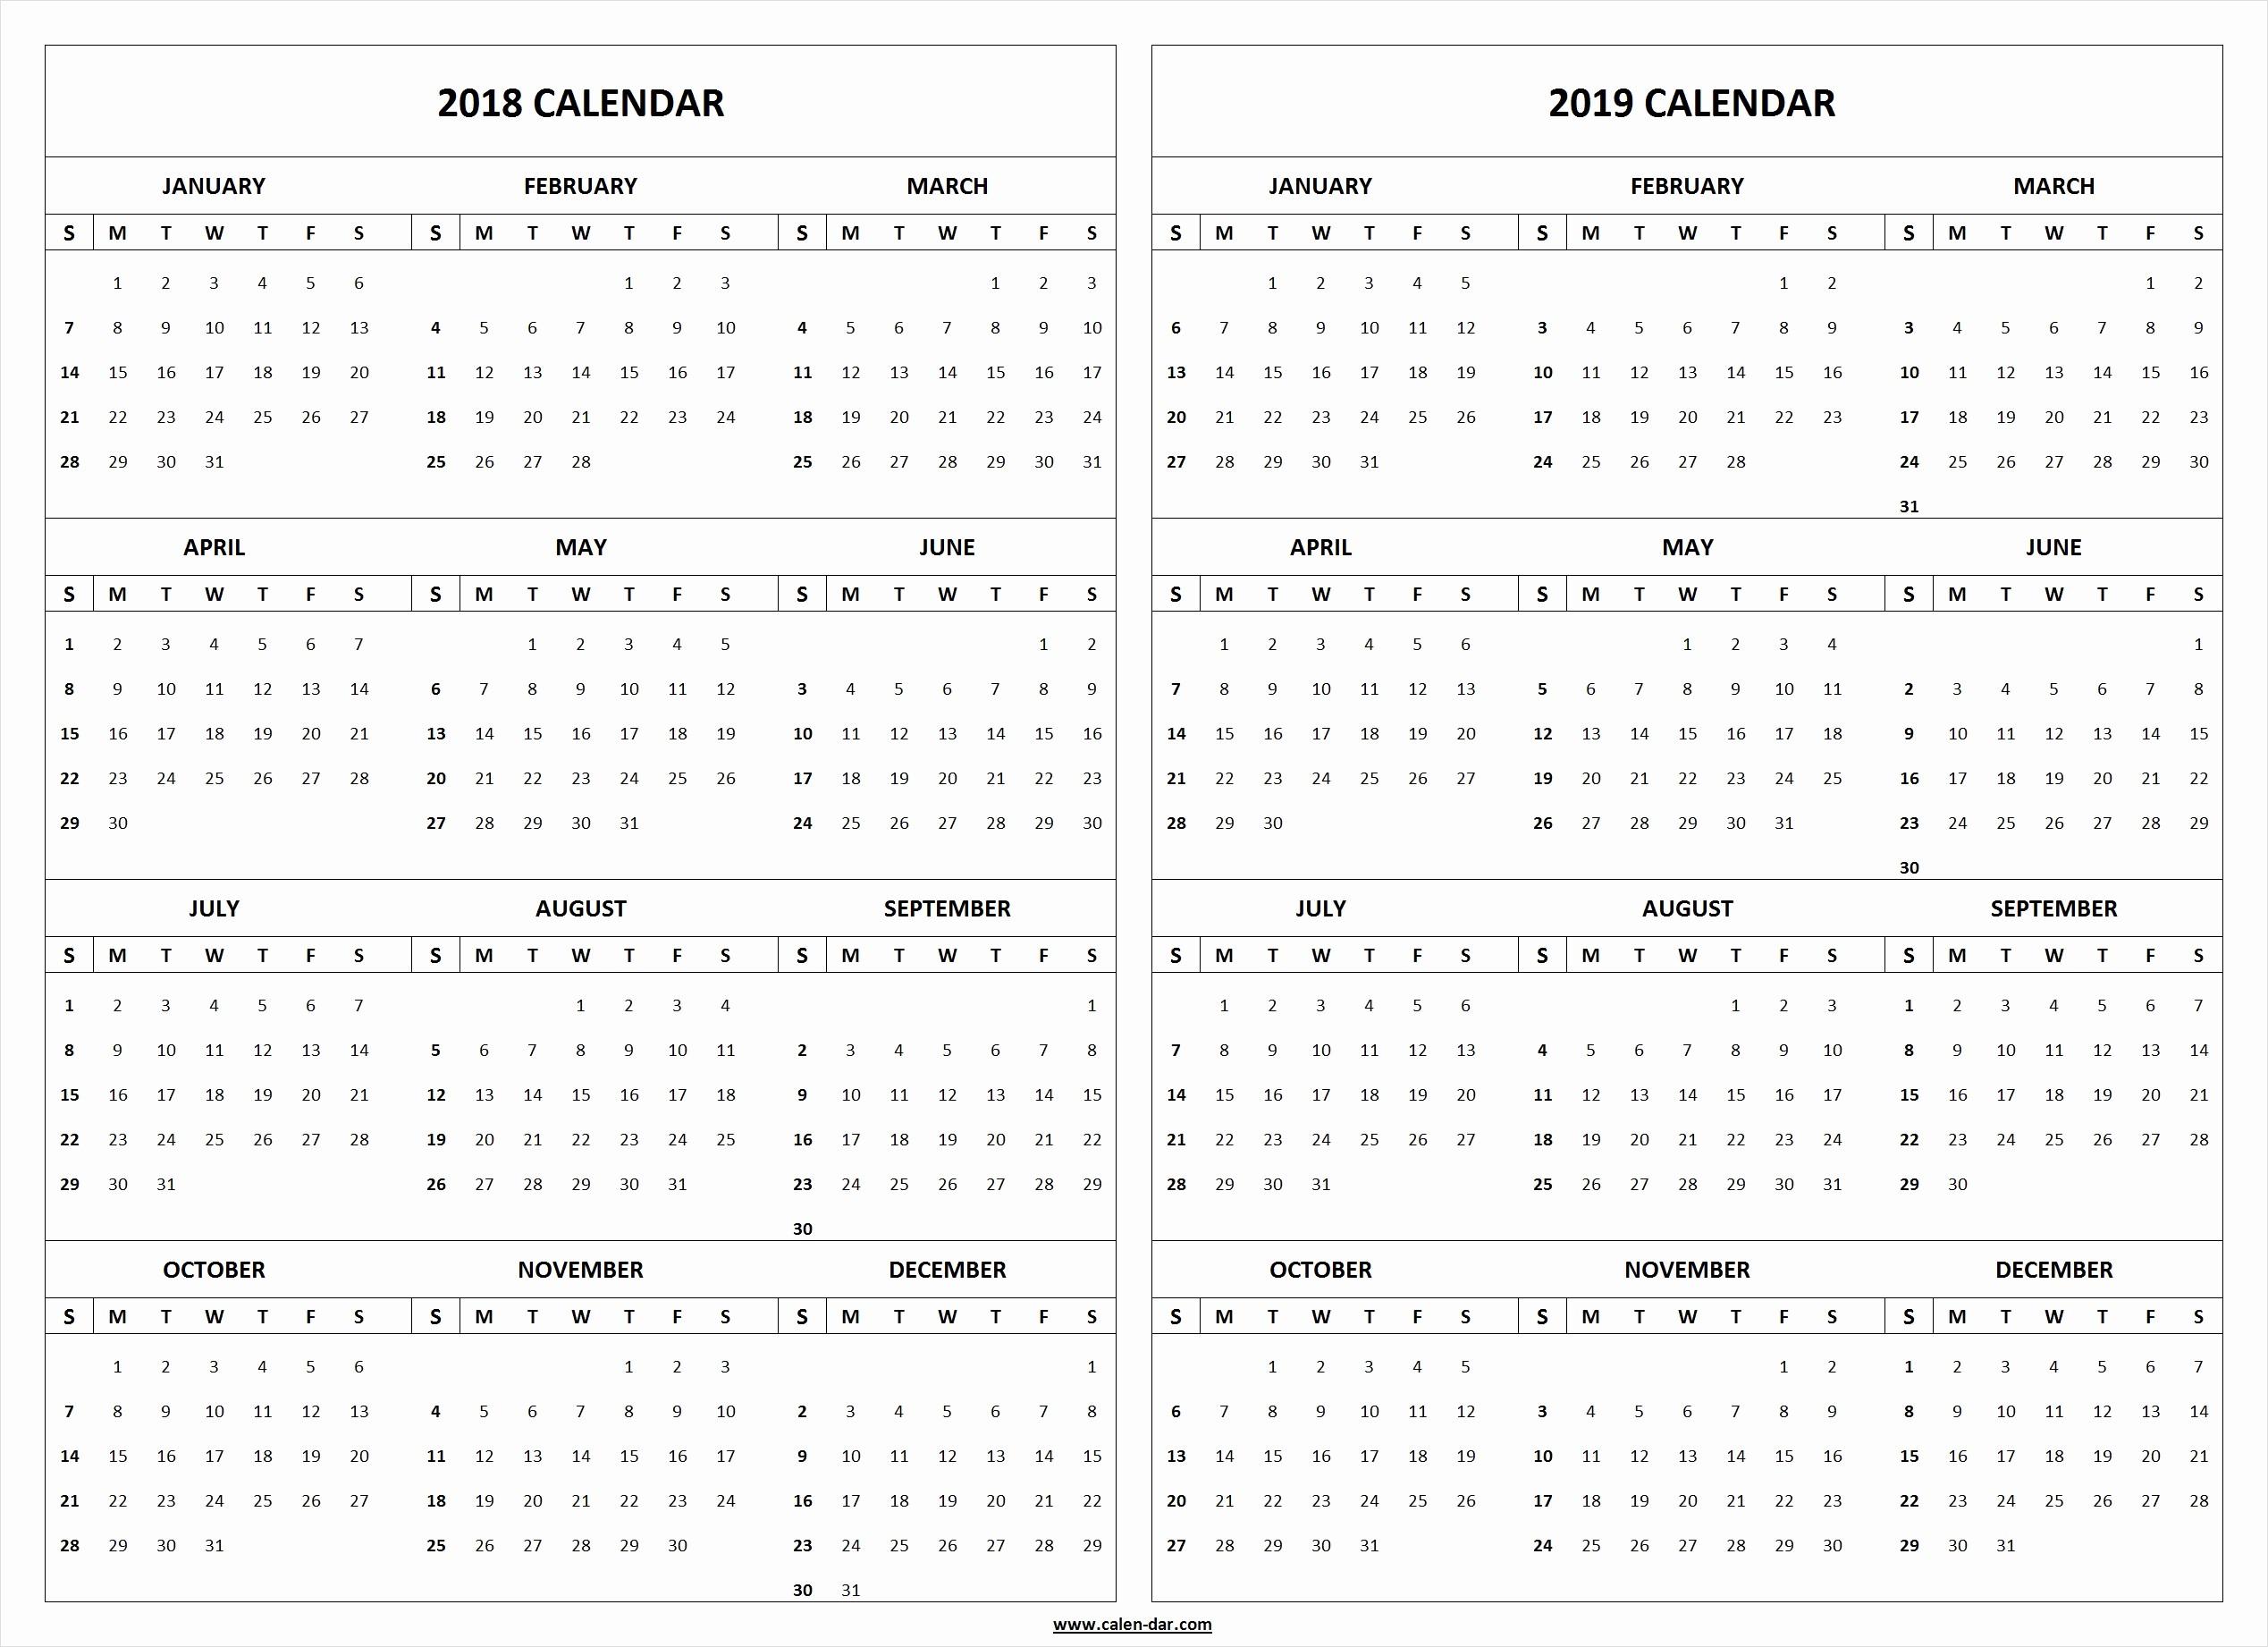 Printable 2018 and 2019 Calendar Beautiful 2018 2019 Calendar Printable Template